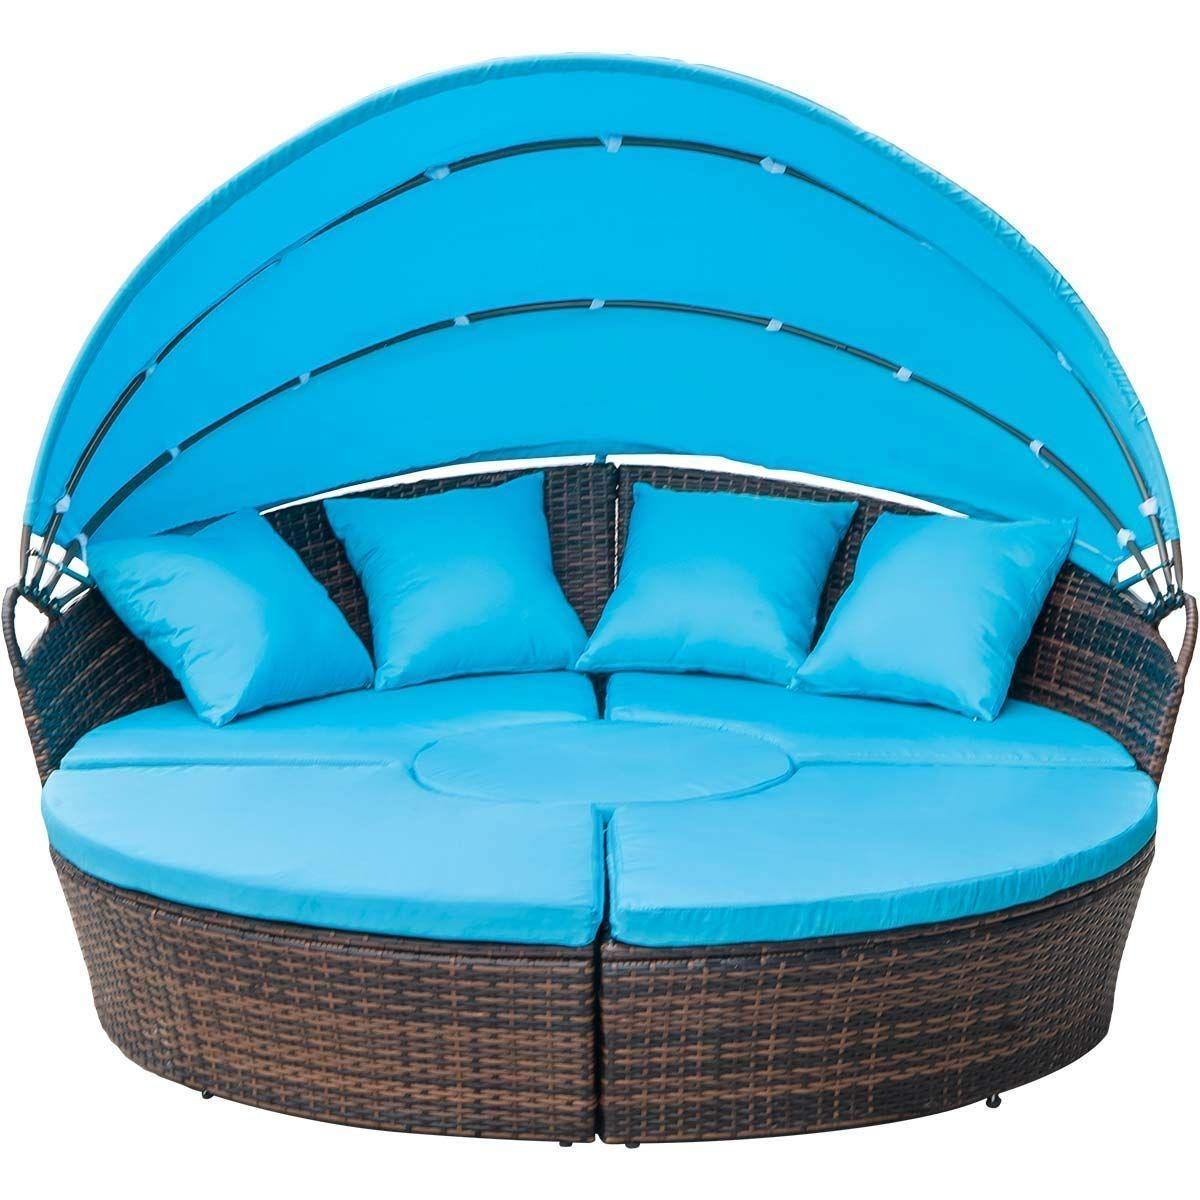 flieks leisure zone outdoor patio backyard poolside furniture wicker rh pinterest com